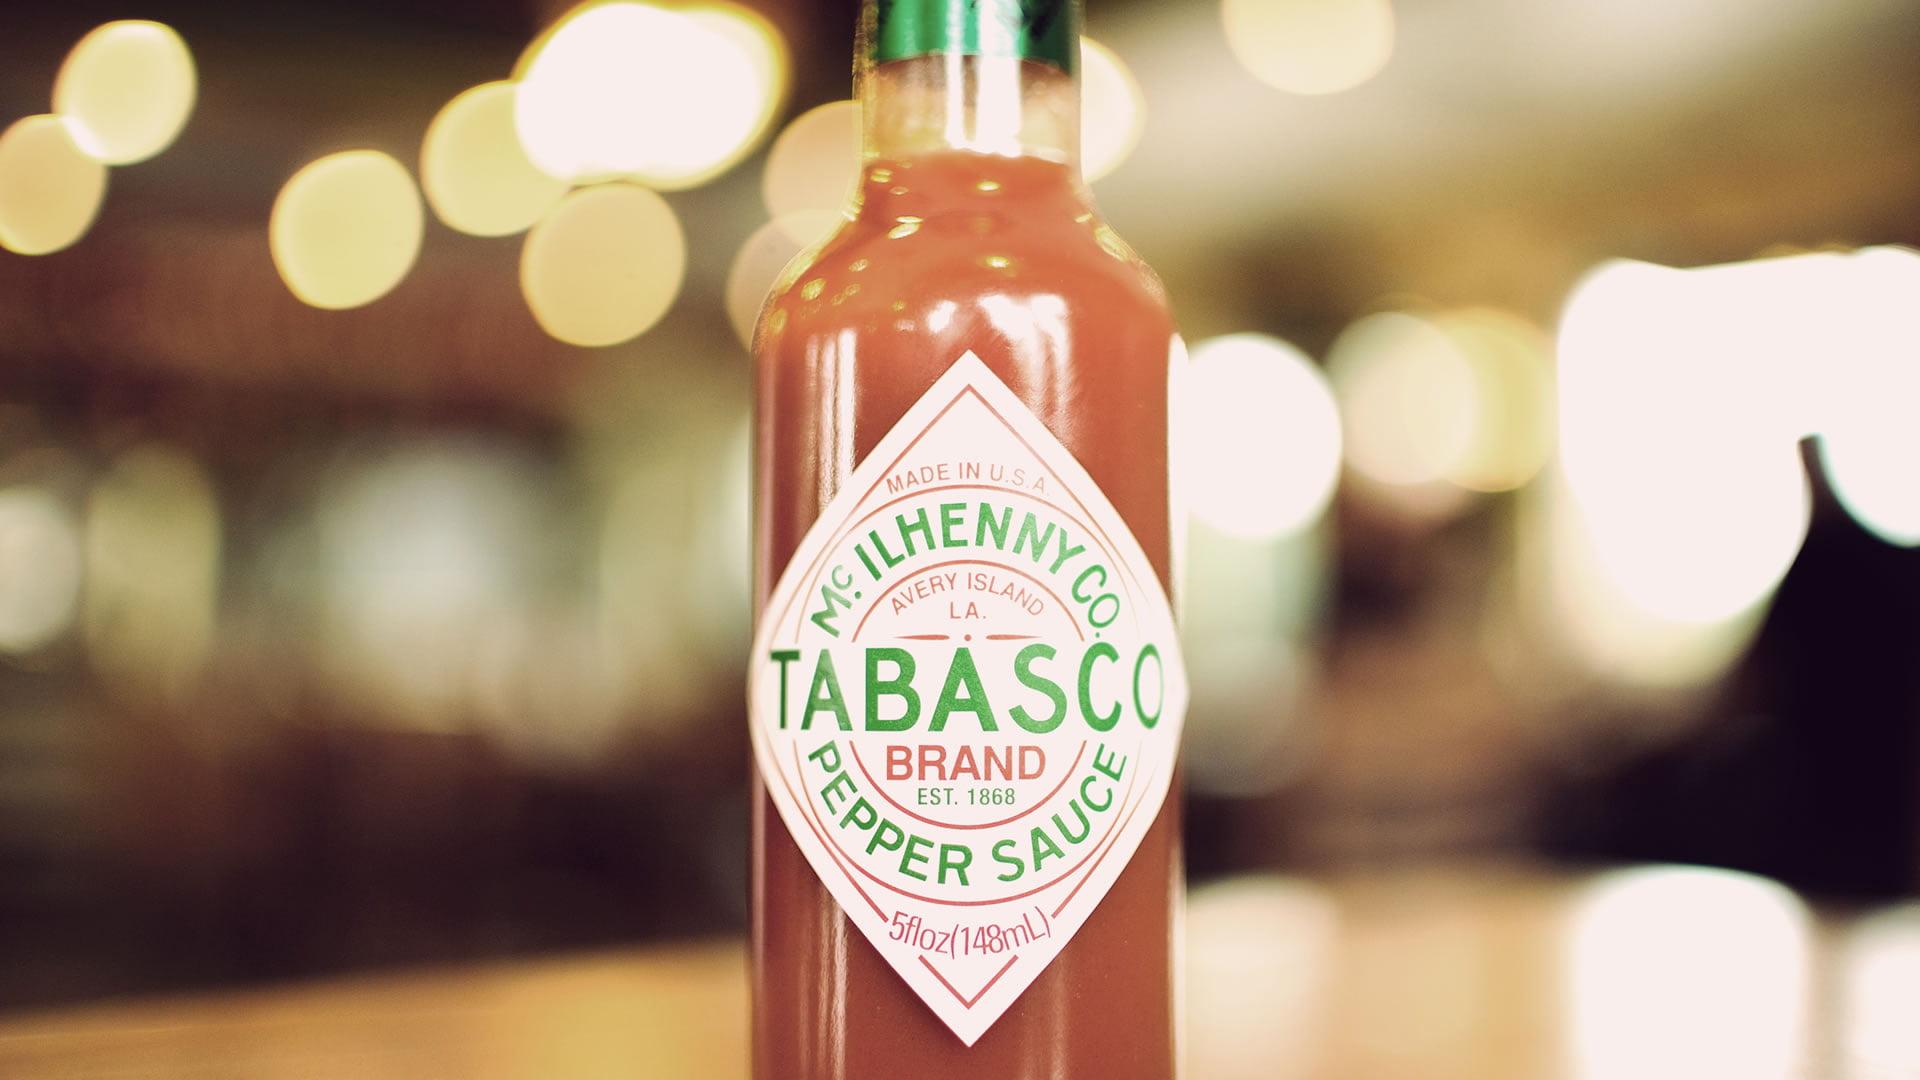 Salsa Tabasco